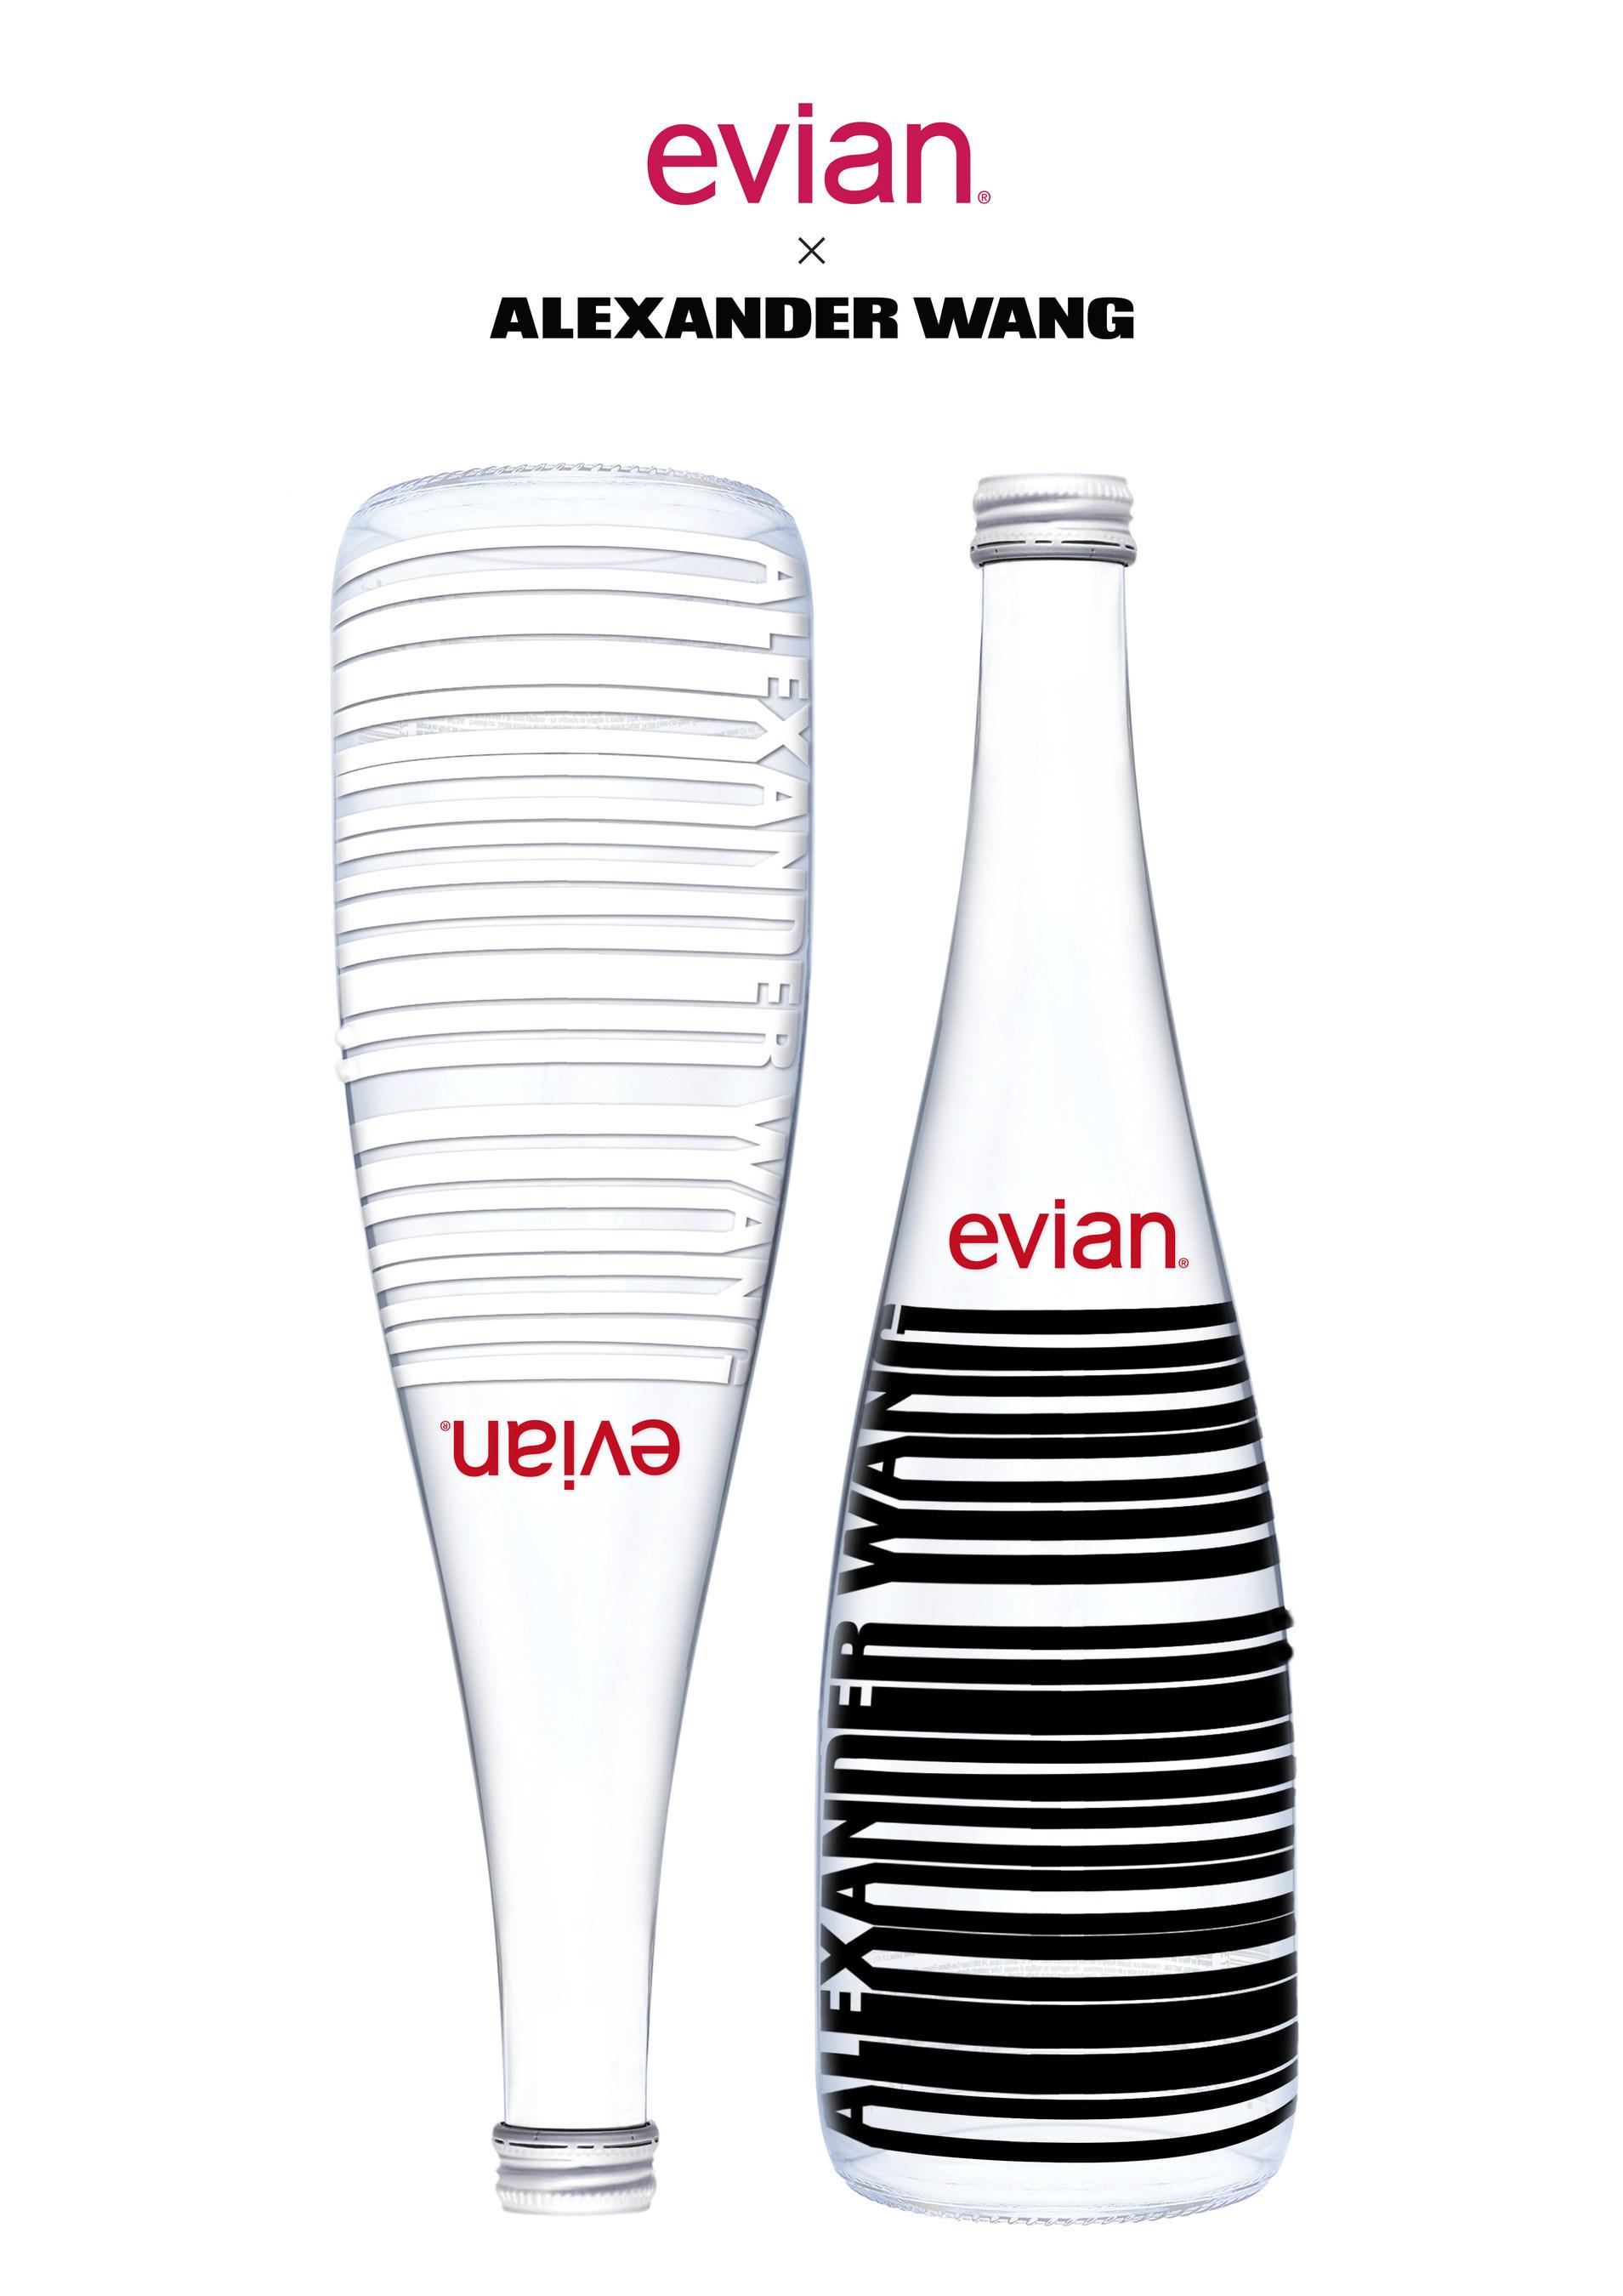 evian + Alexander Wang Limited Edition Bottle